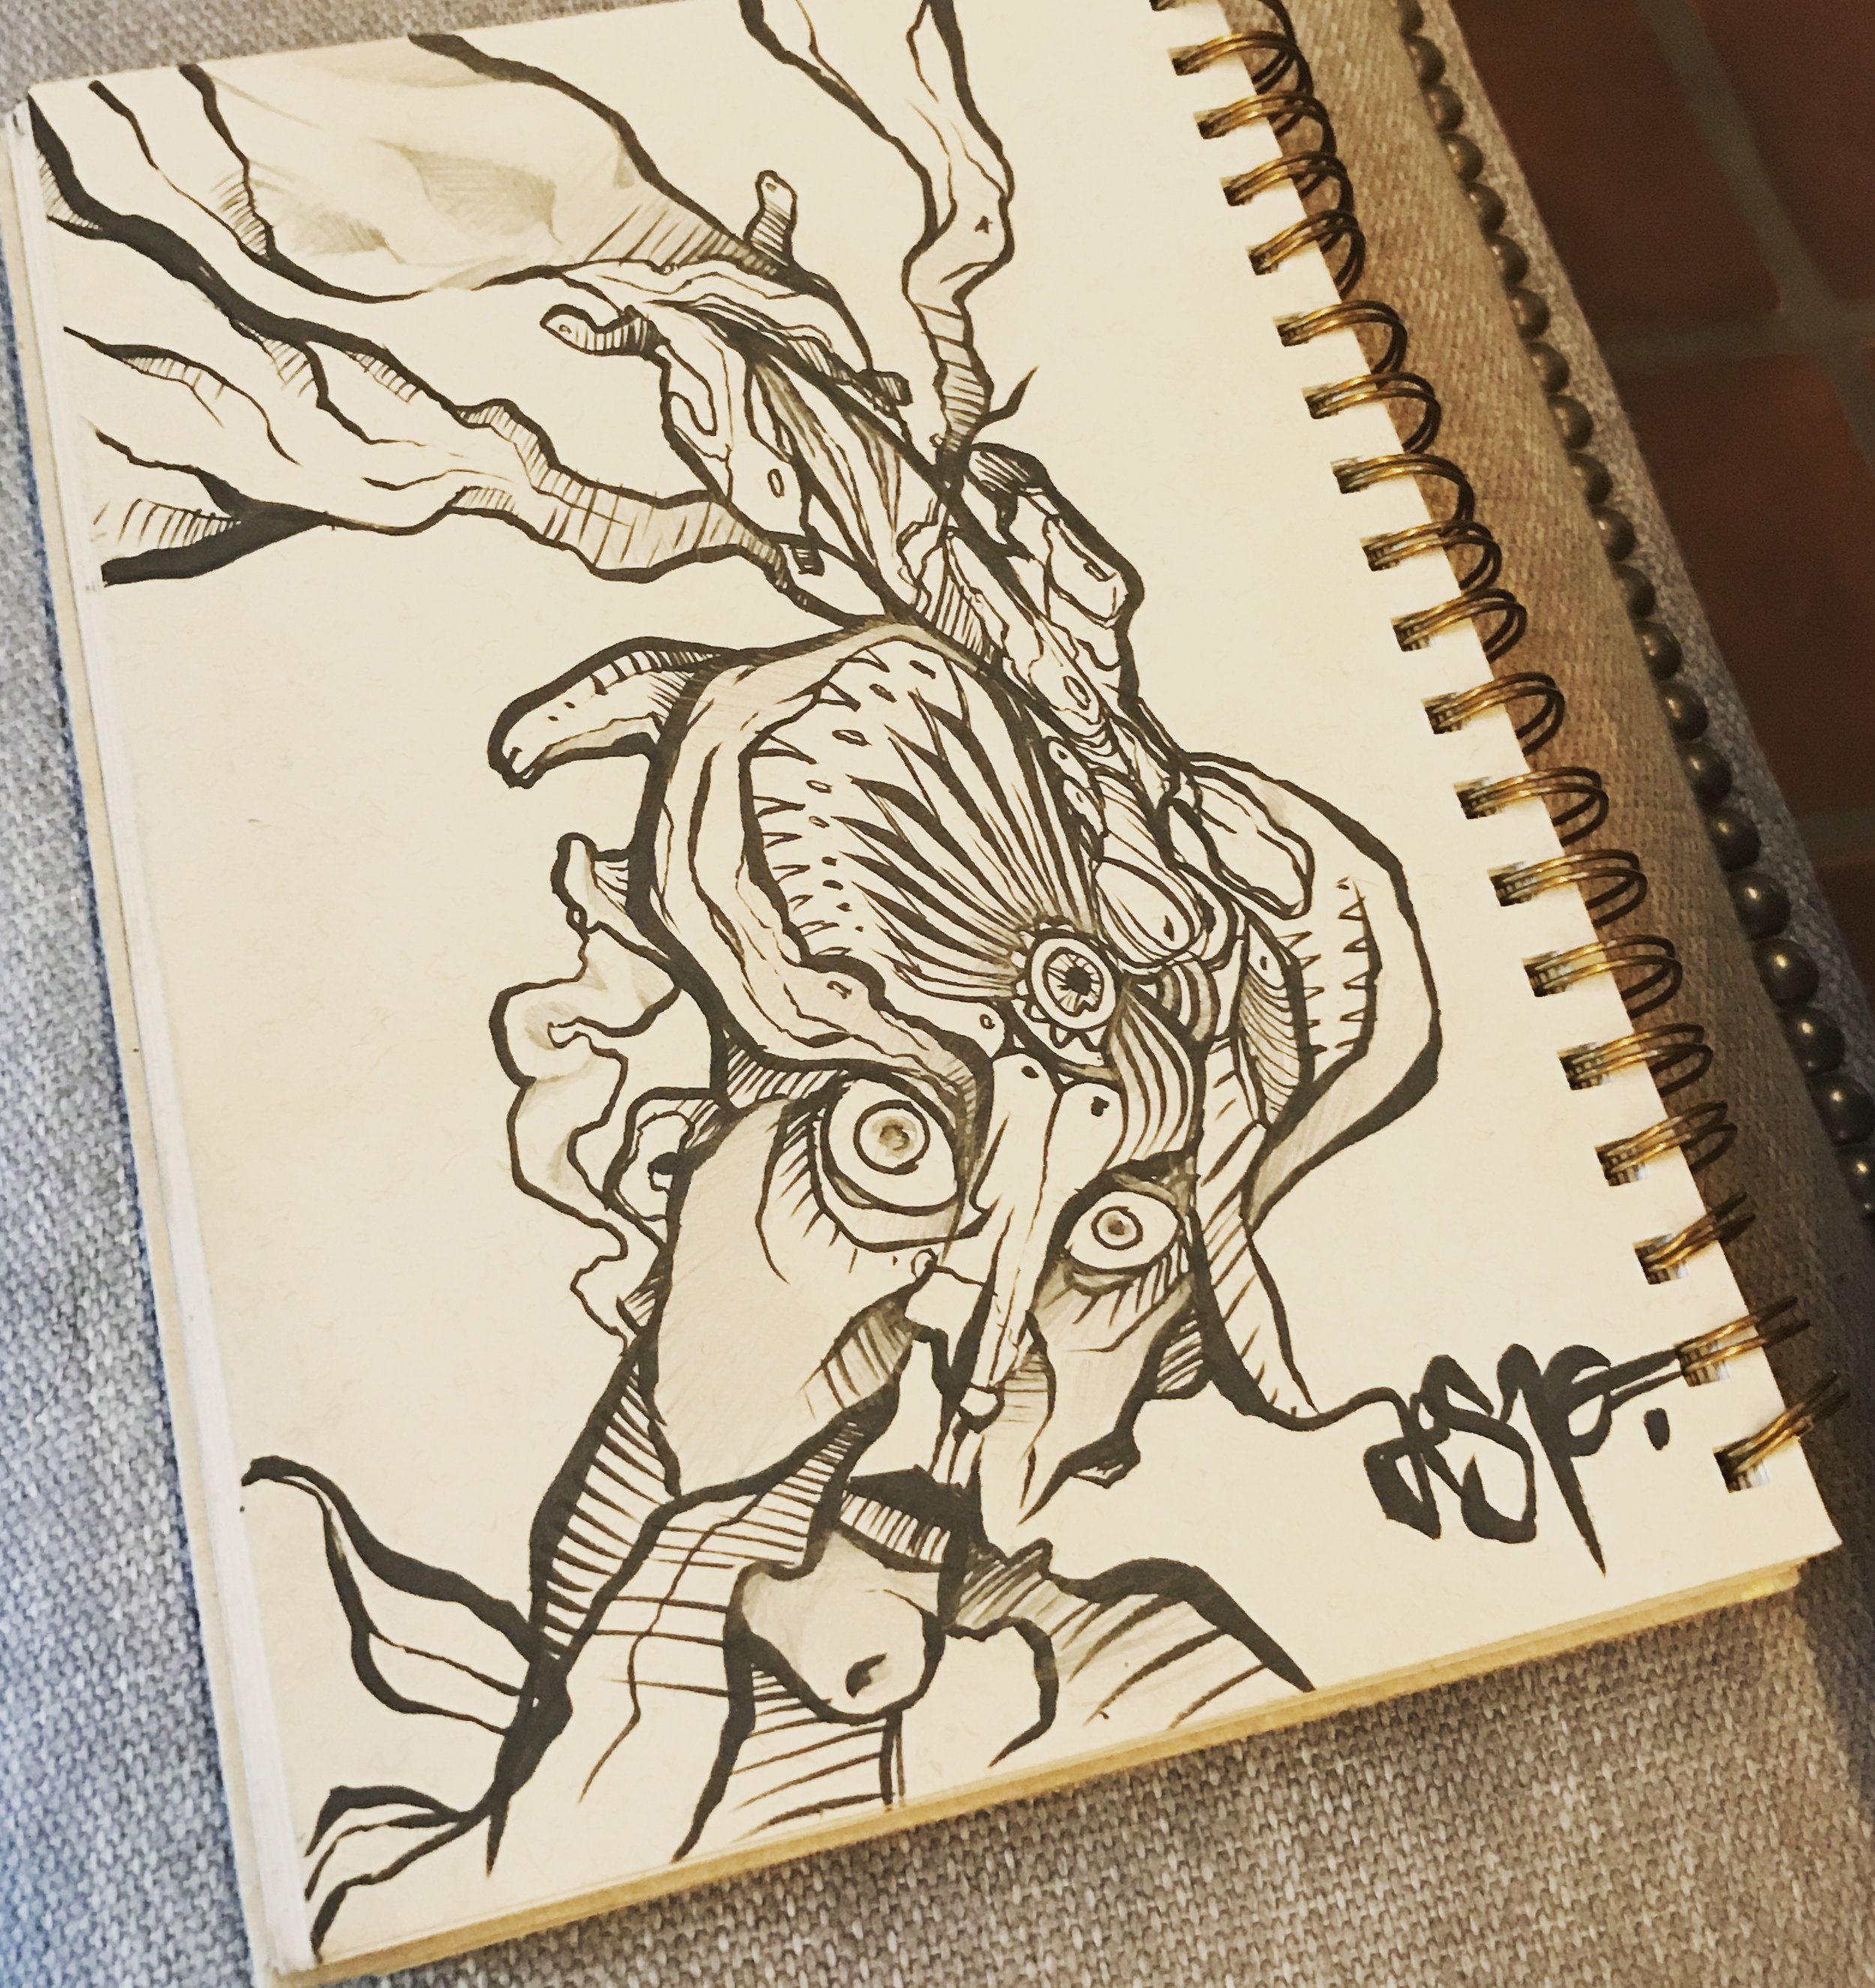 Drawing-4-edited.jpg